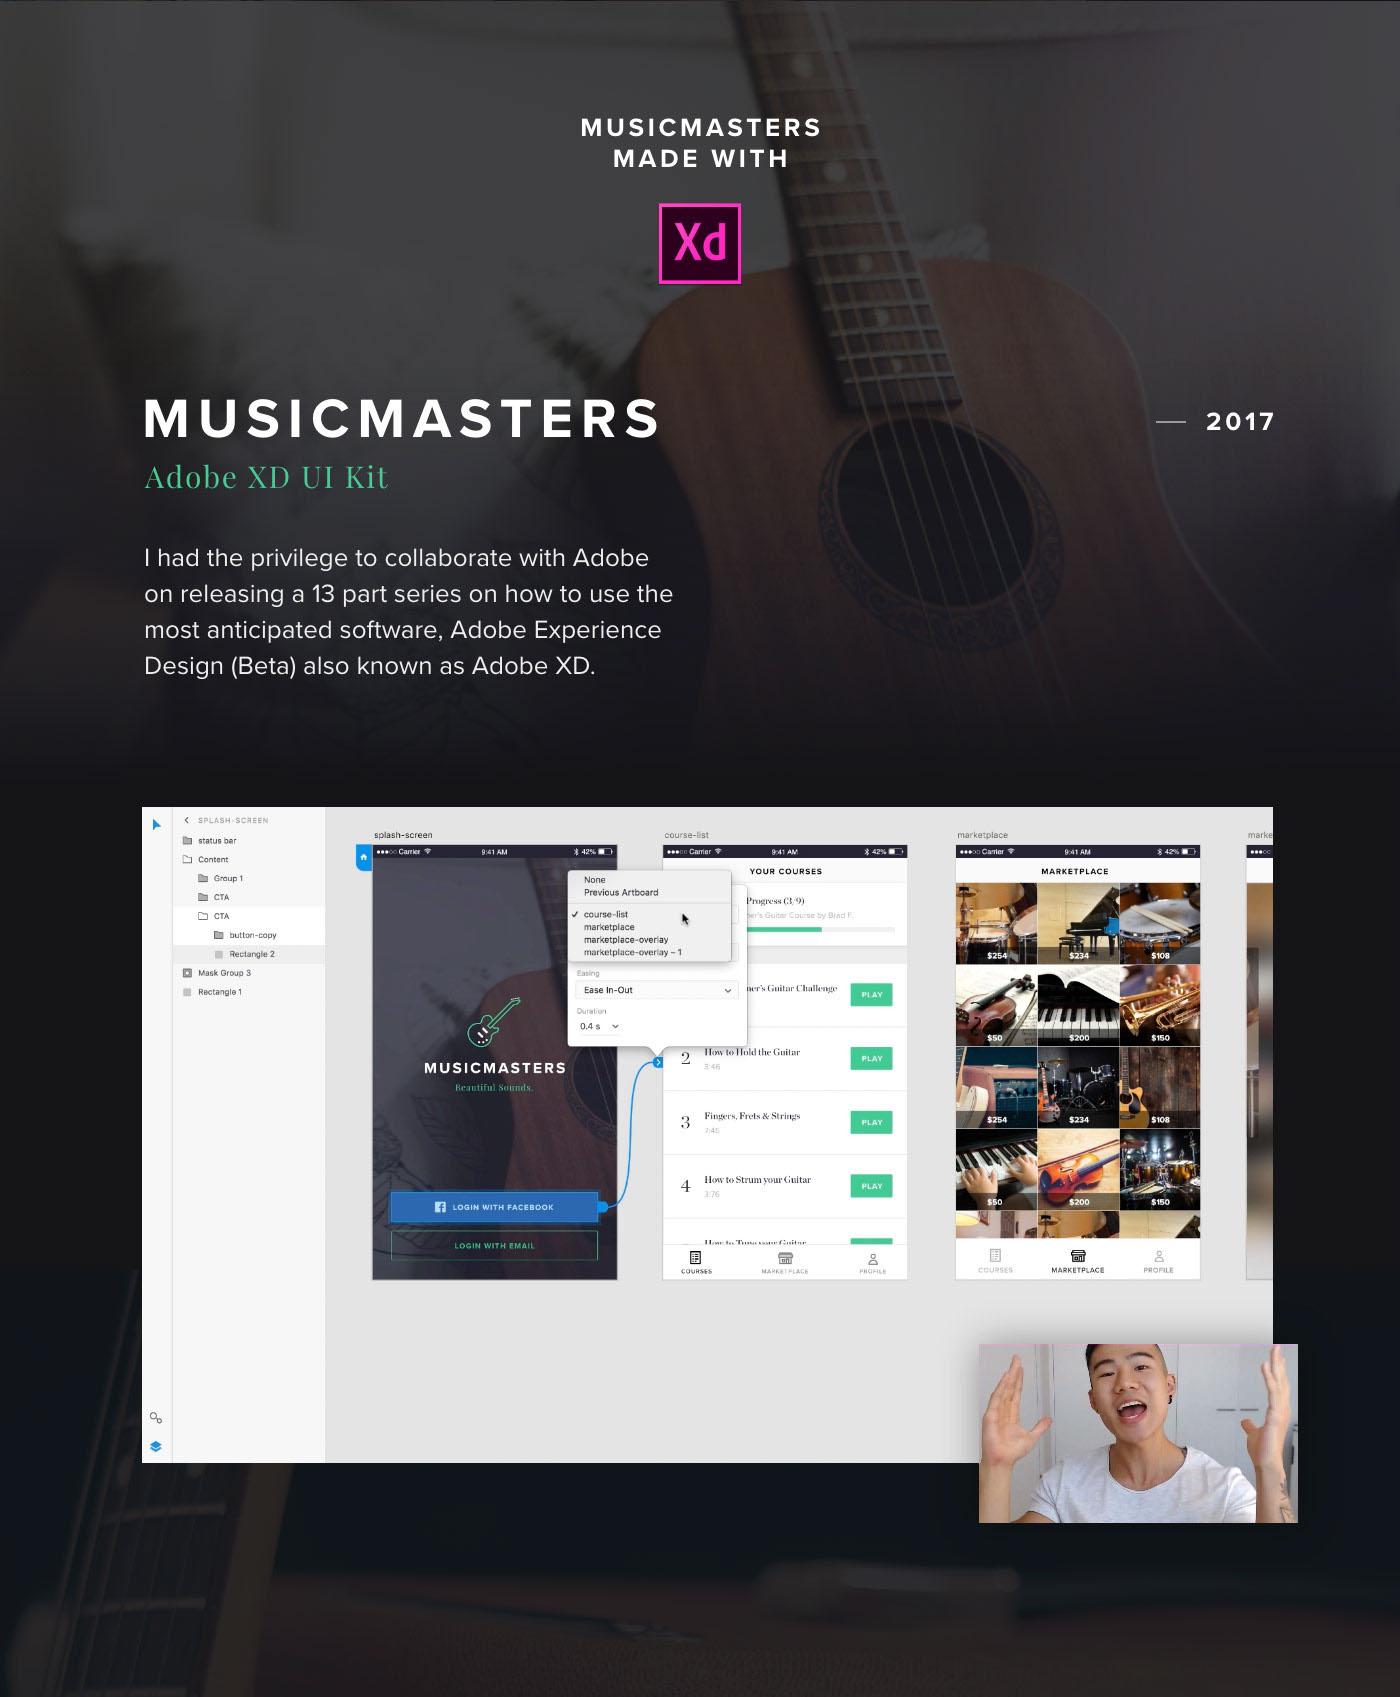 adobe user experience ui design freebie user interface design MadeWithAdobeXd app design iOS design prototype